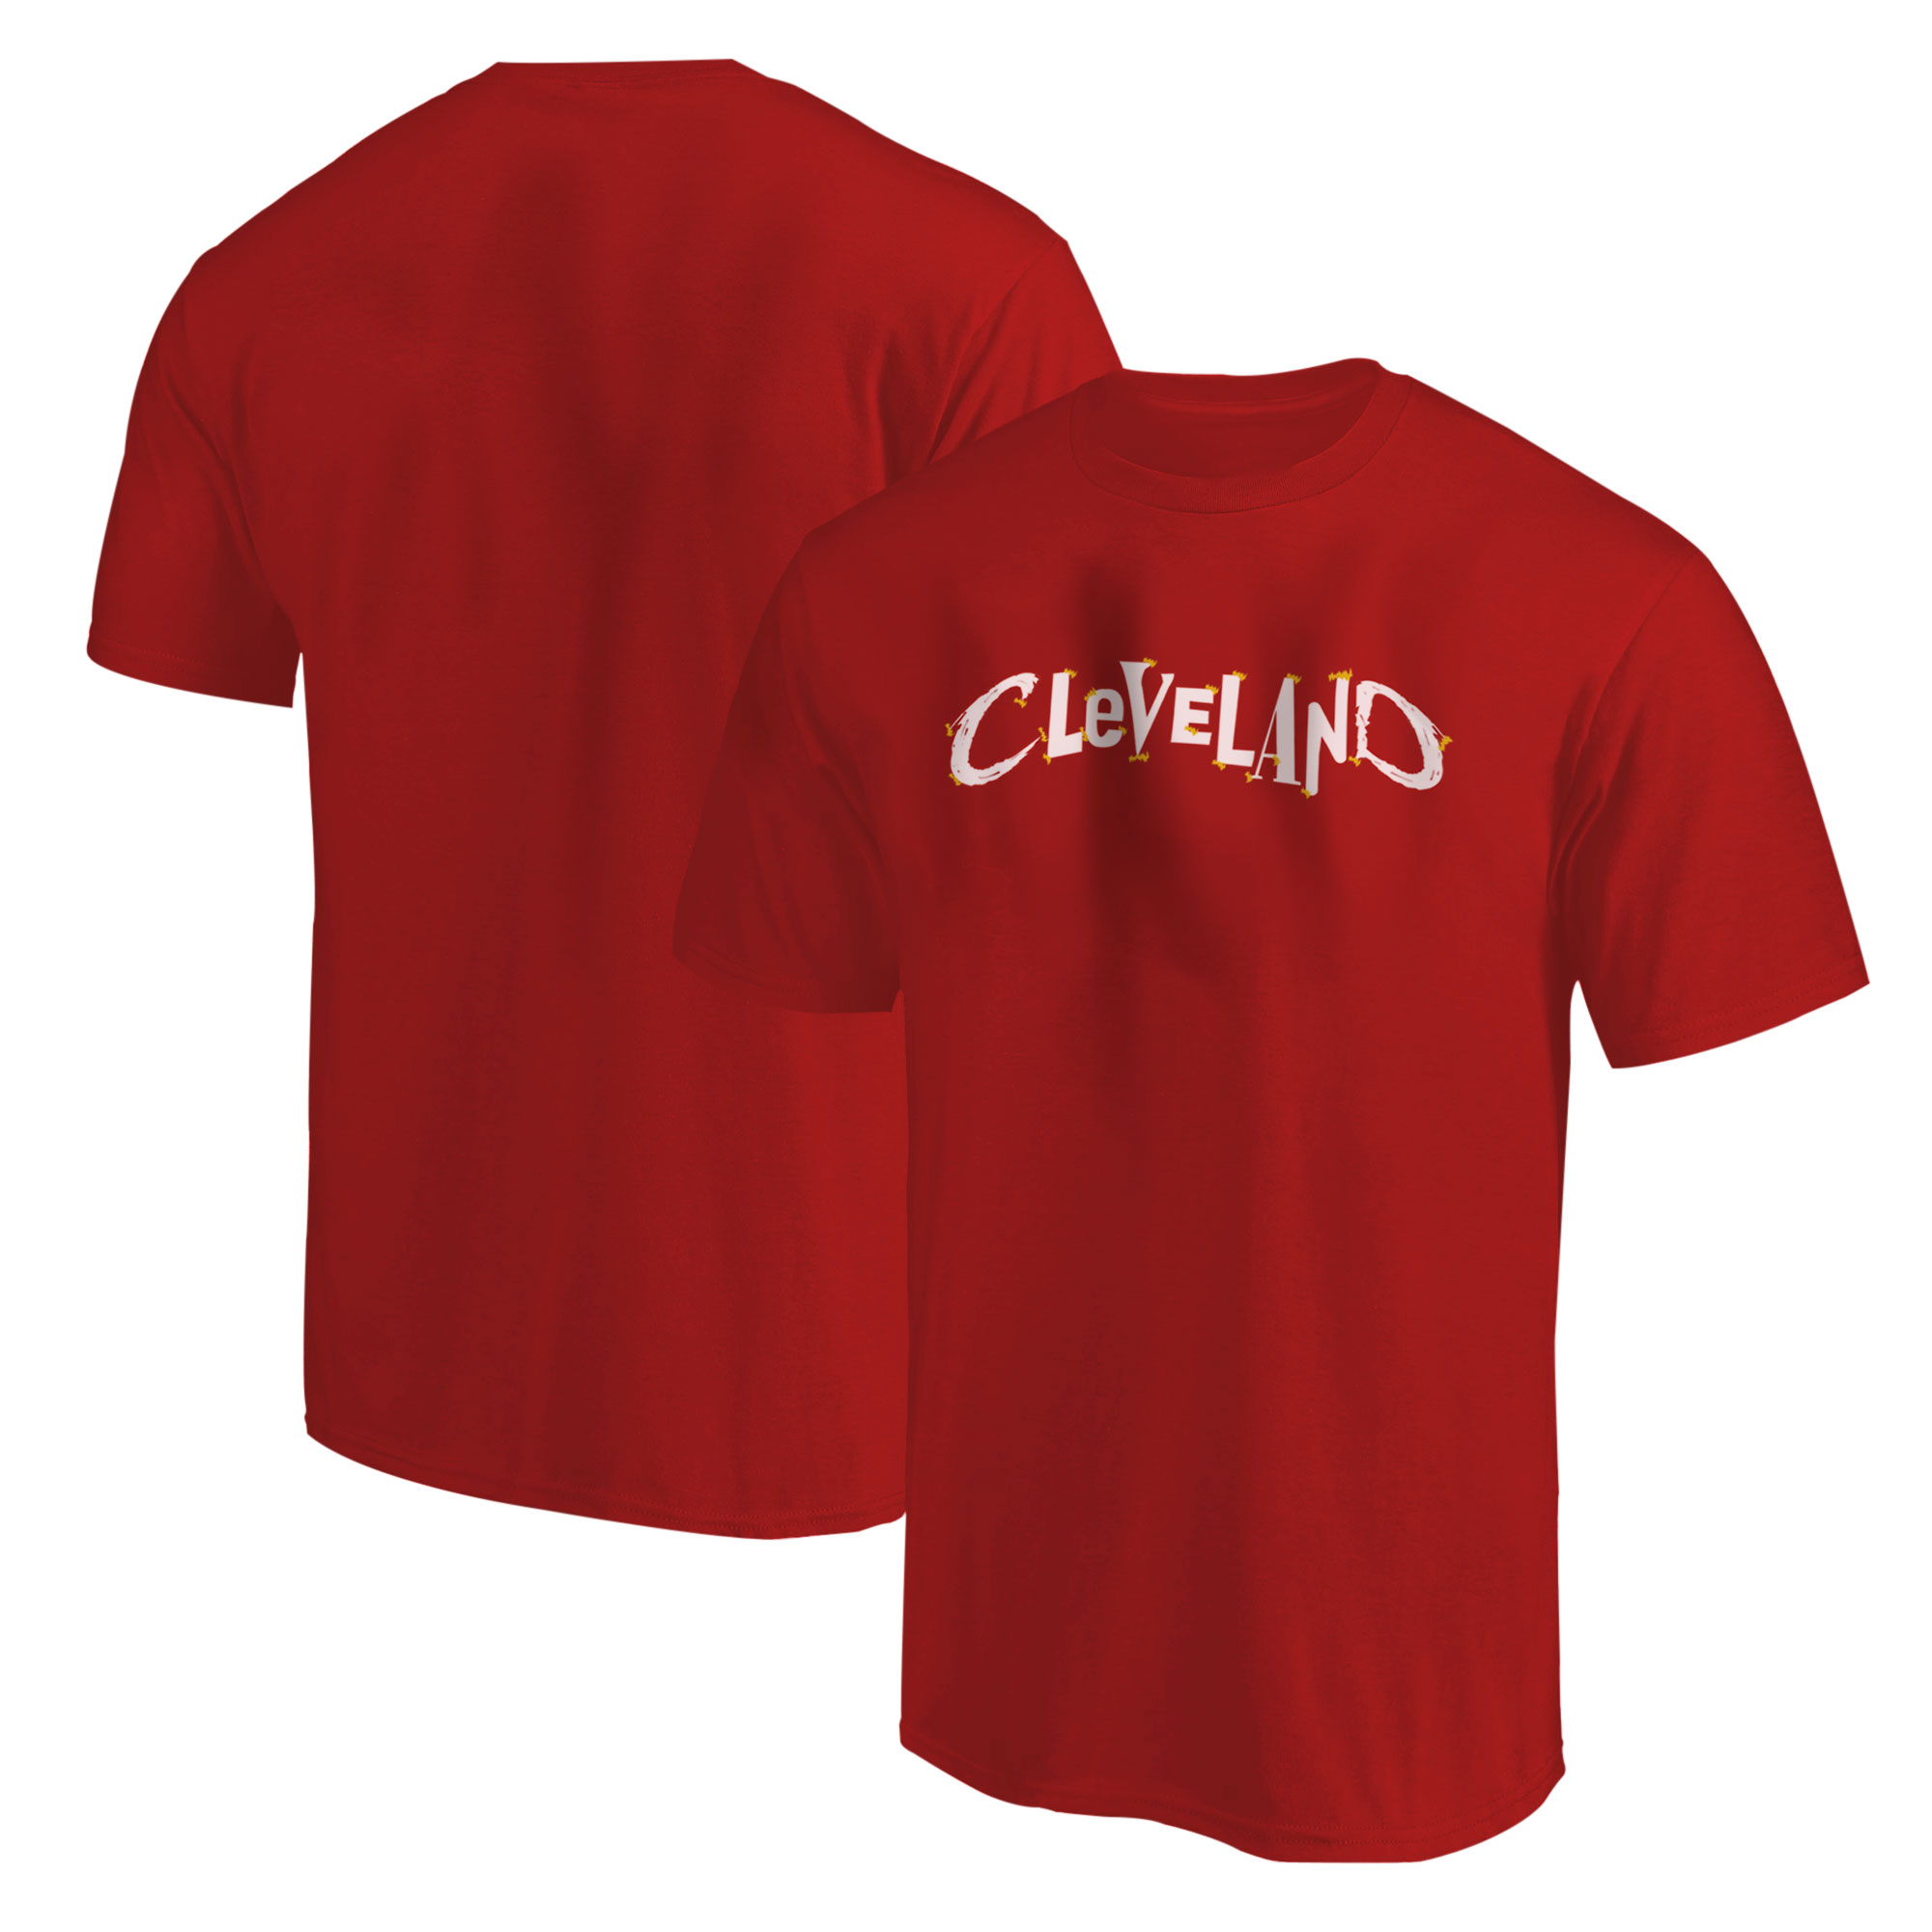 Cleveland City Edition Tshirt (TSH-RED-485-NBA-CLEVELAND-CITY)